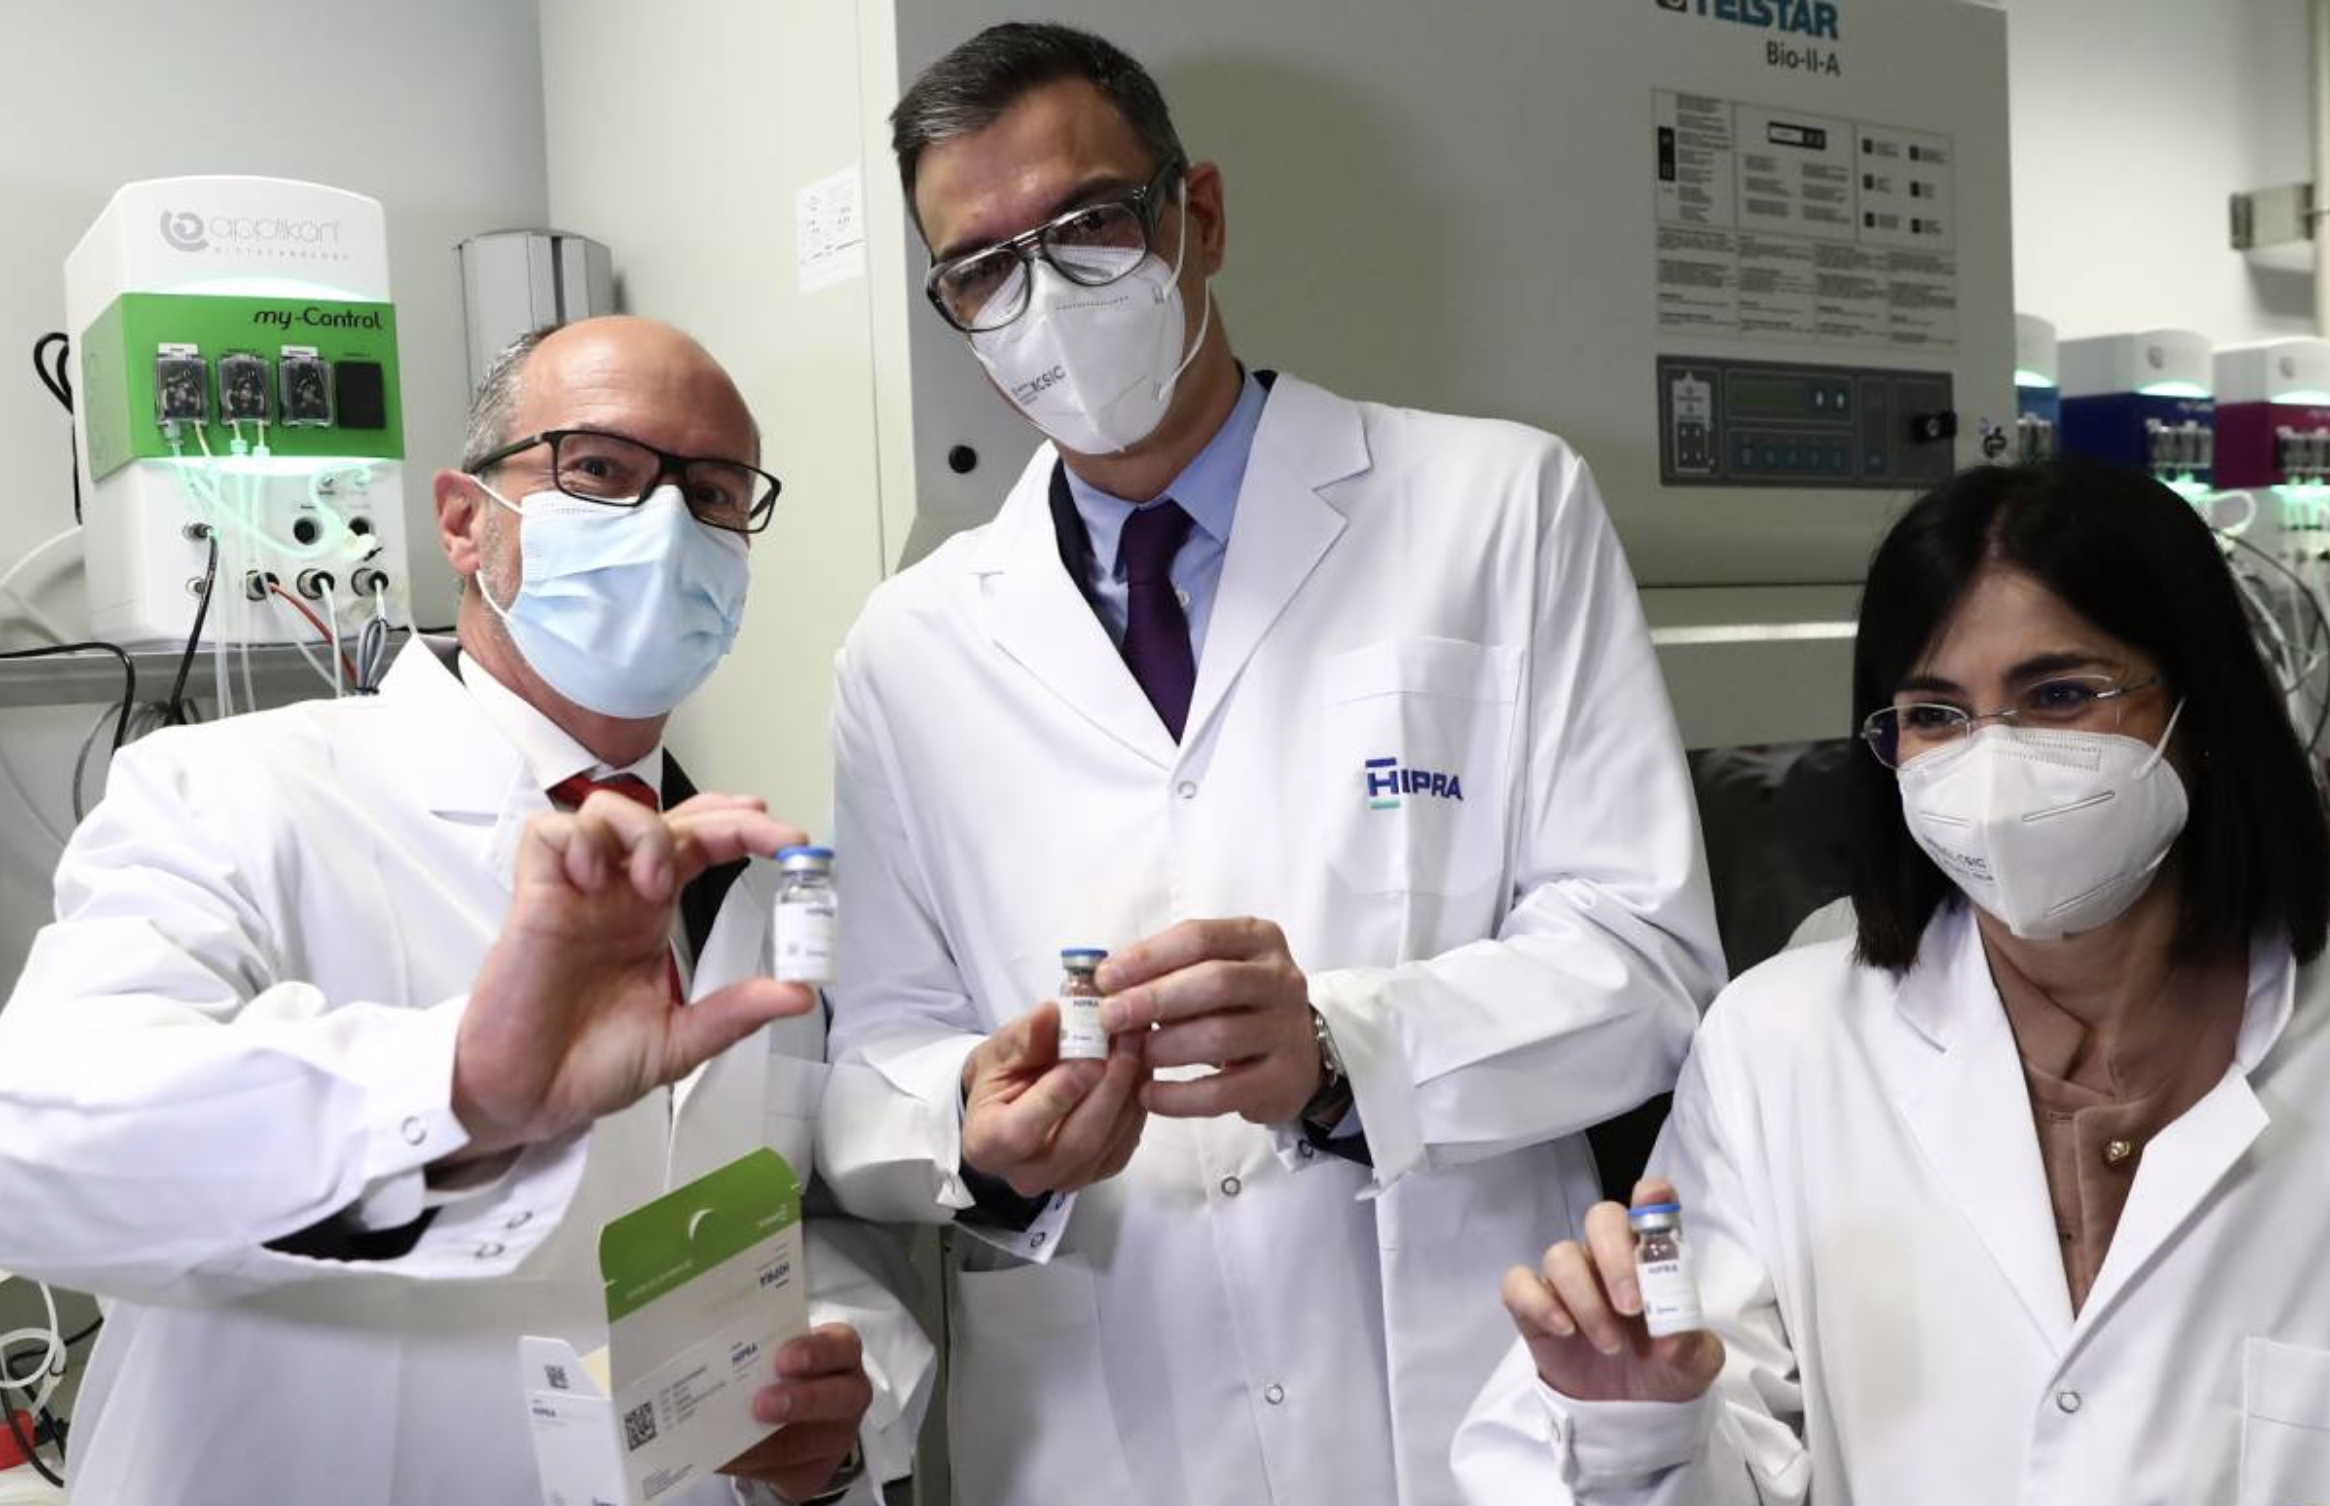 T&T Group xúc tiến mua 50 triệu liều vaccine phòng Covid-19 từ châu Âu